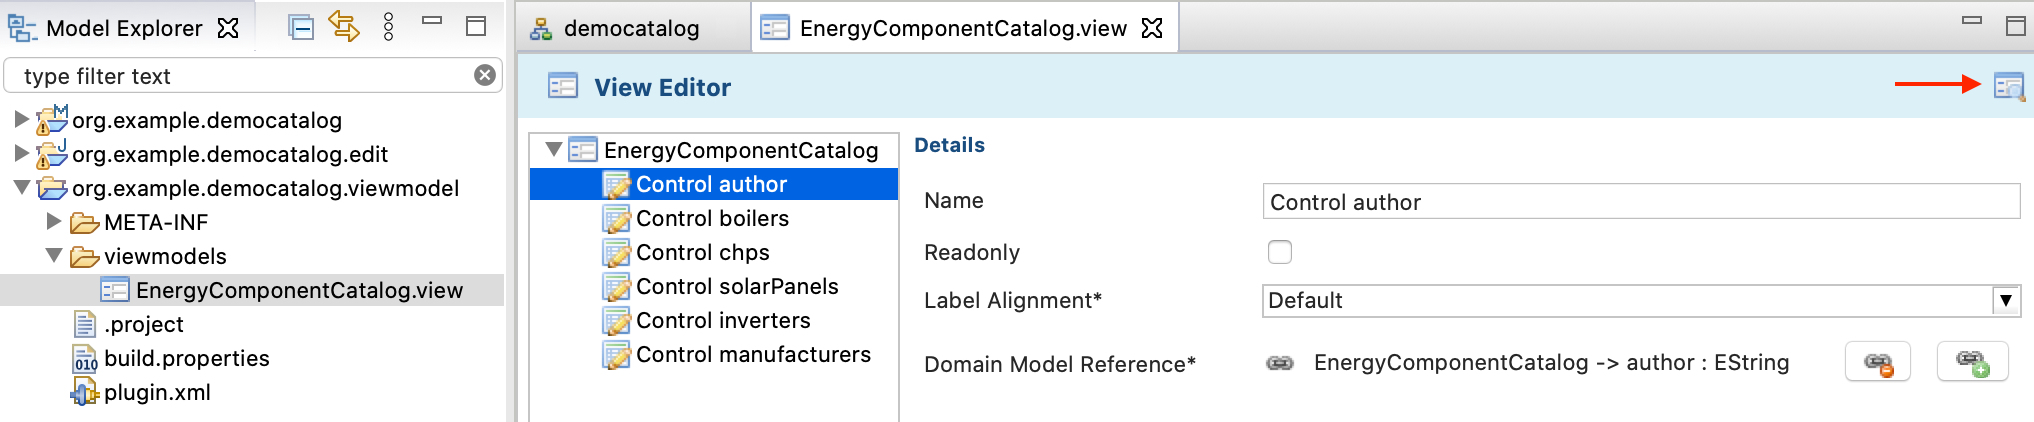 ParameterCatalogs2Images/ViewModel.png